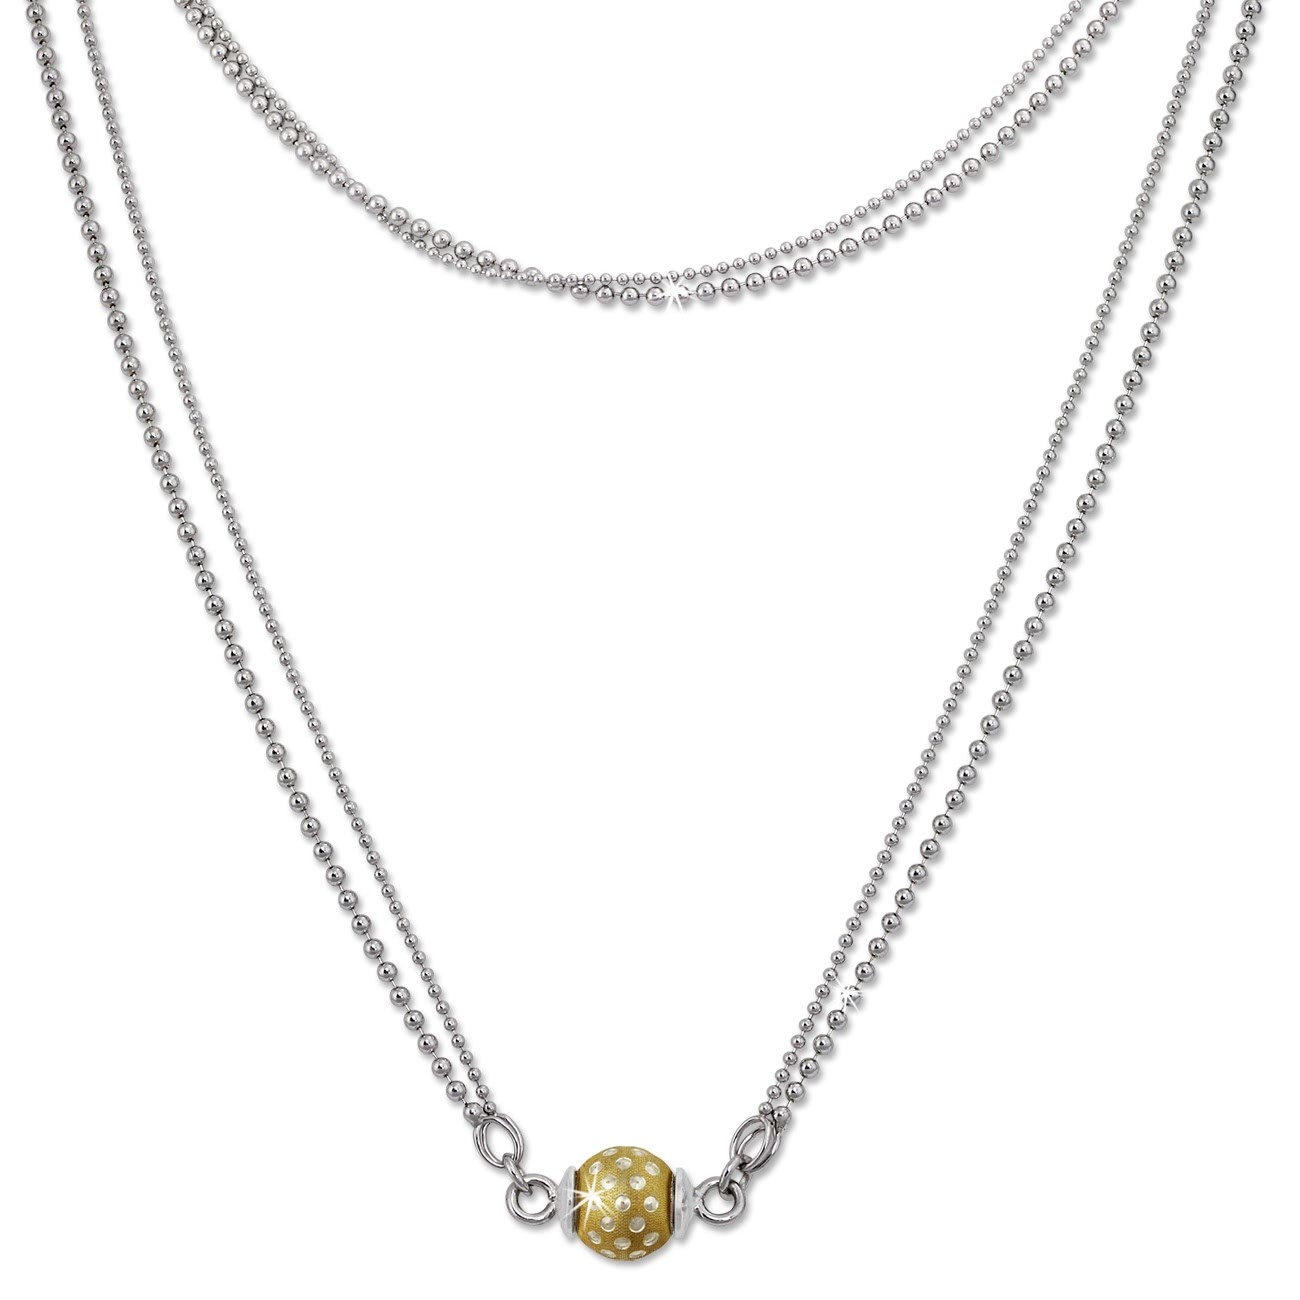 SilberDream Collier Kette Kugel Punkte vergoldet 925 Silber Damen 45cm SDK24645Y